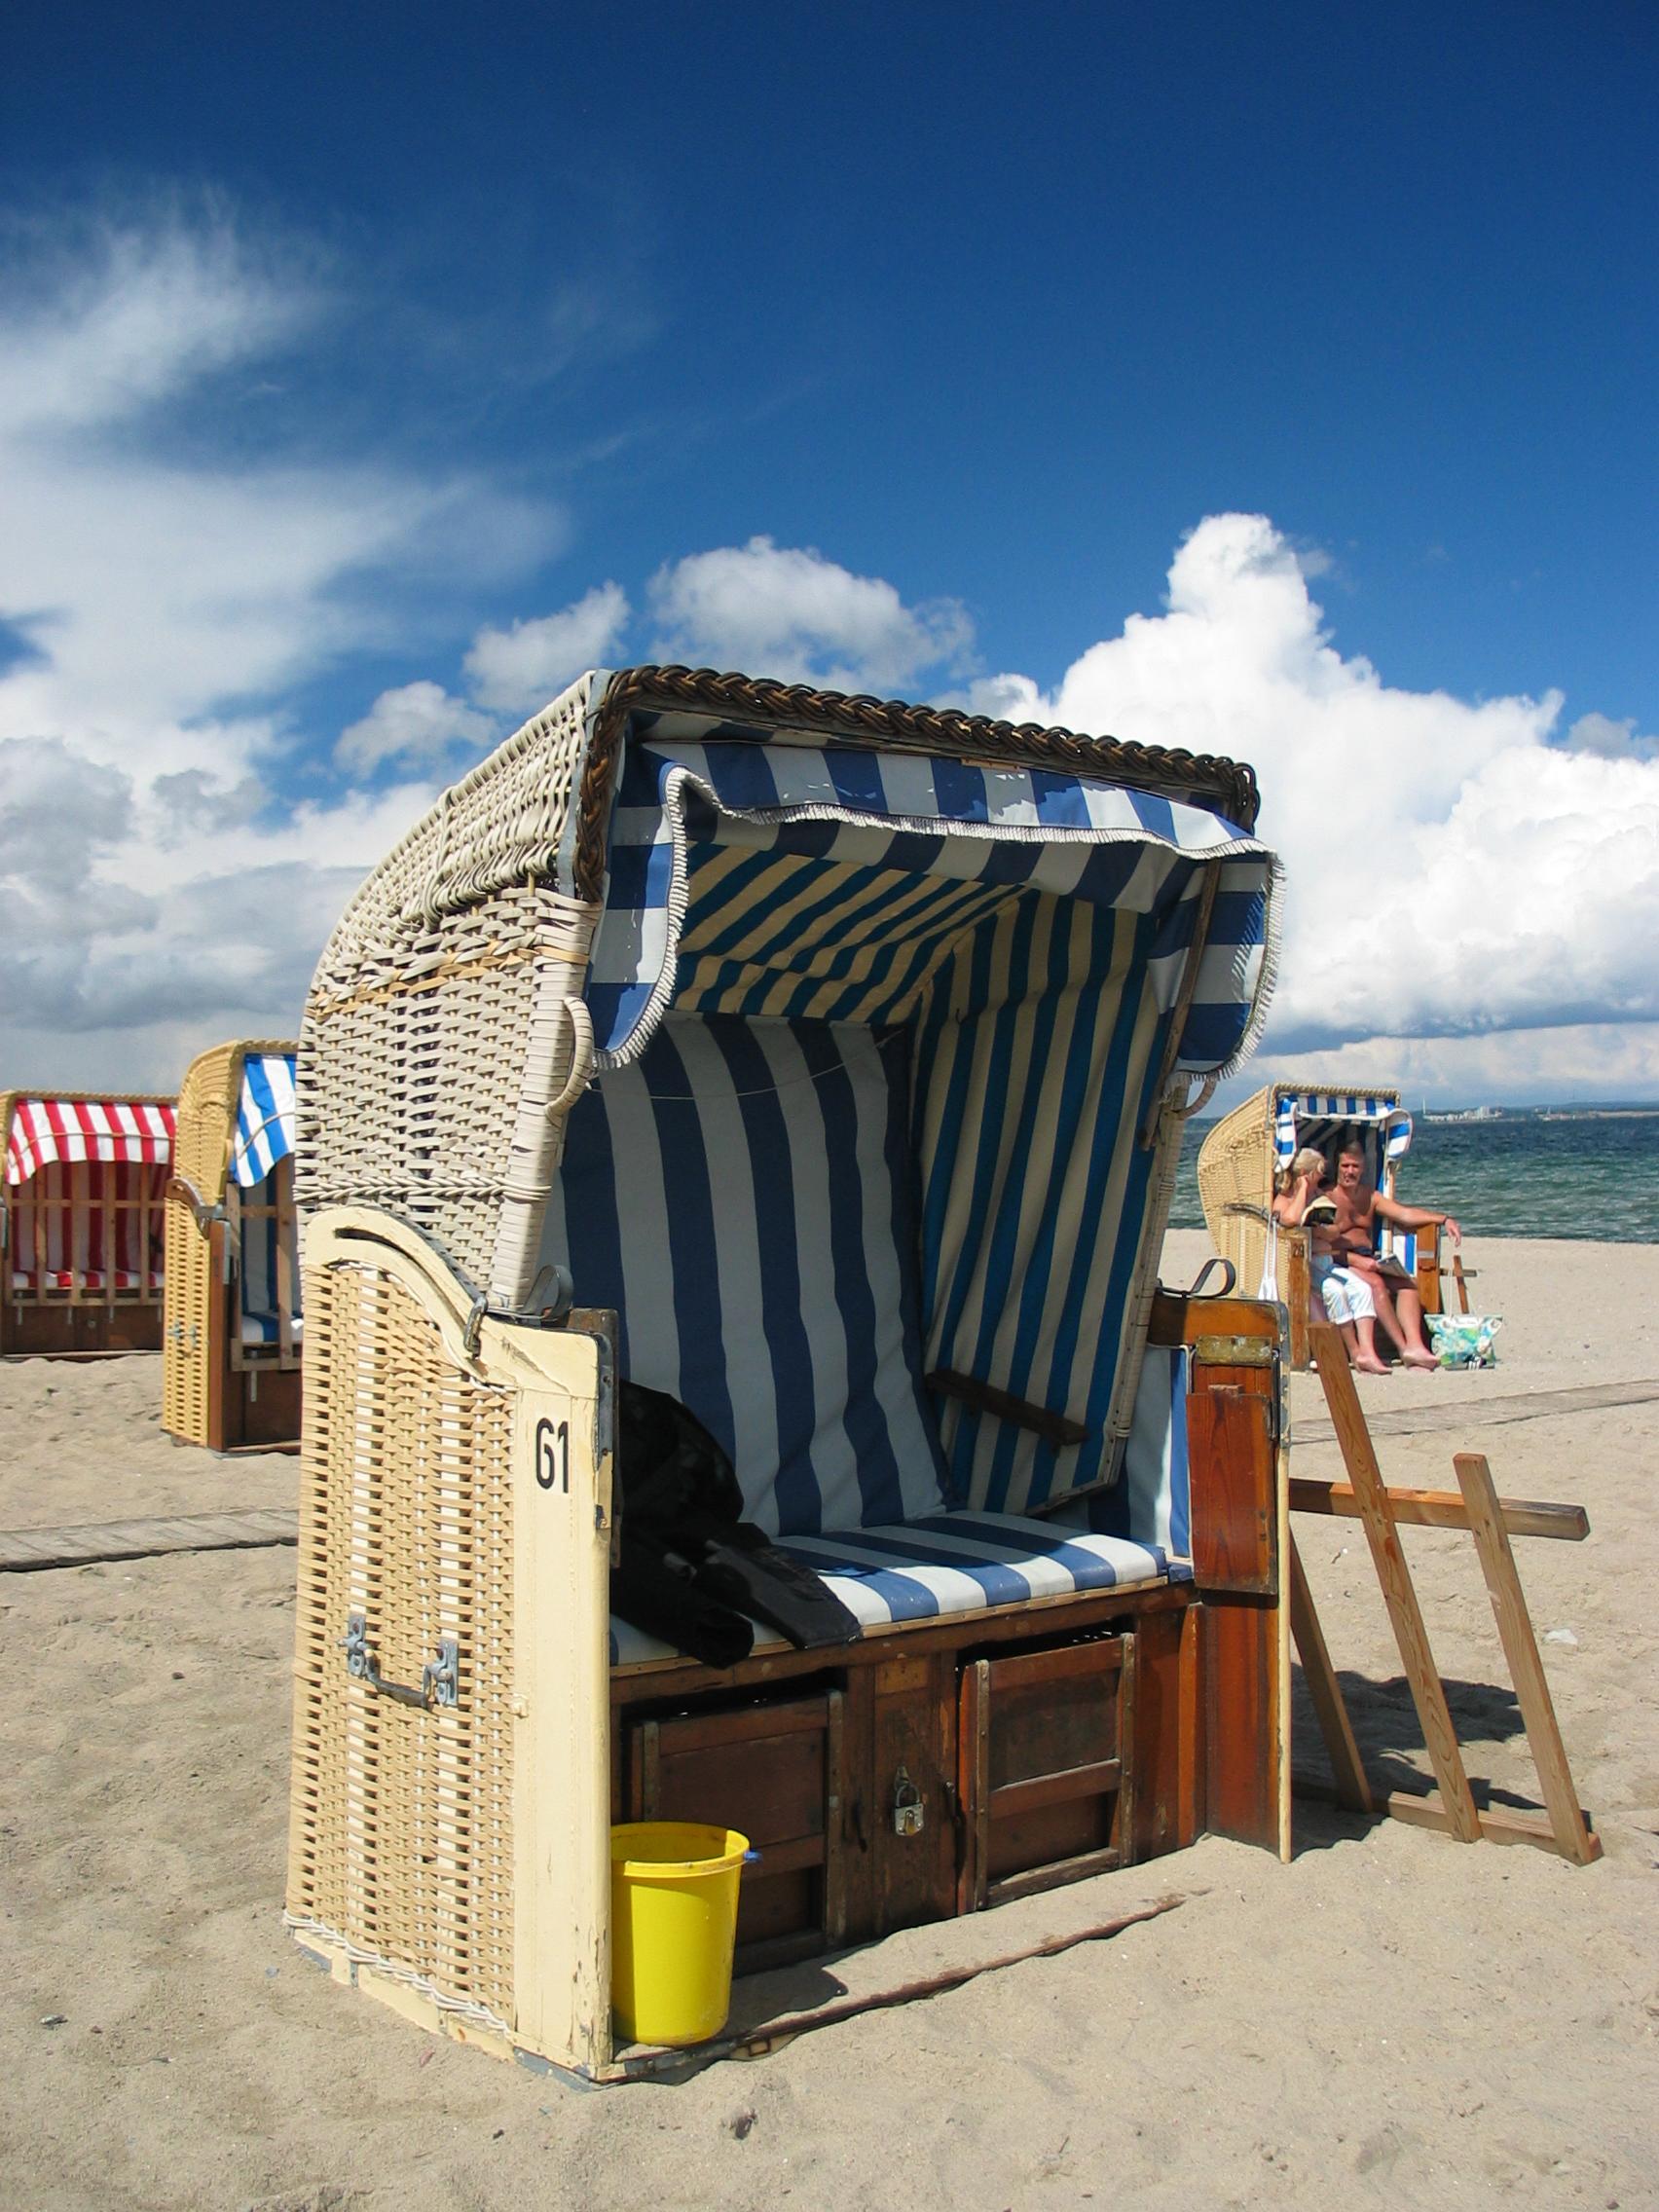 Best Beach Relaxing Vacations